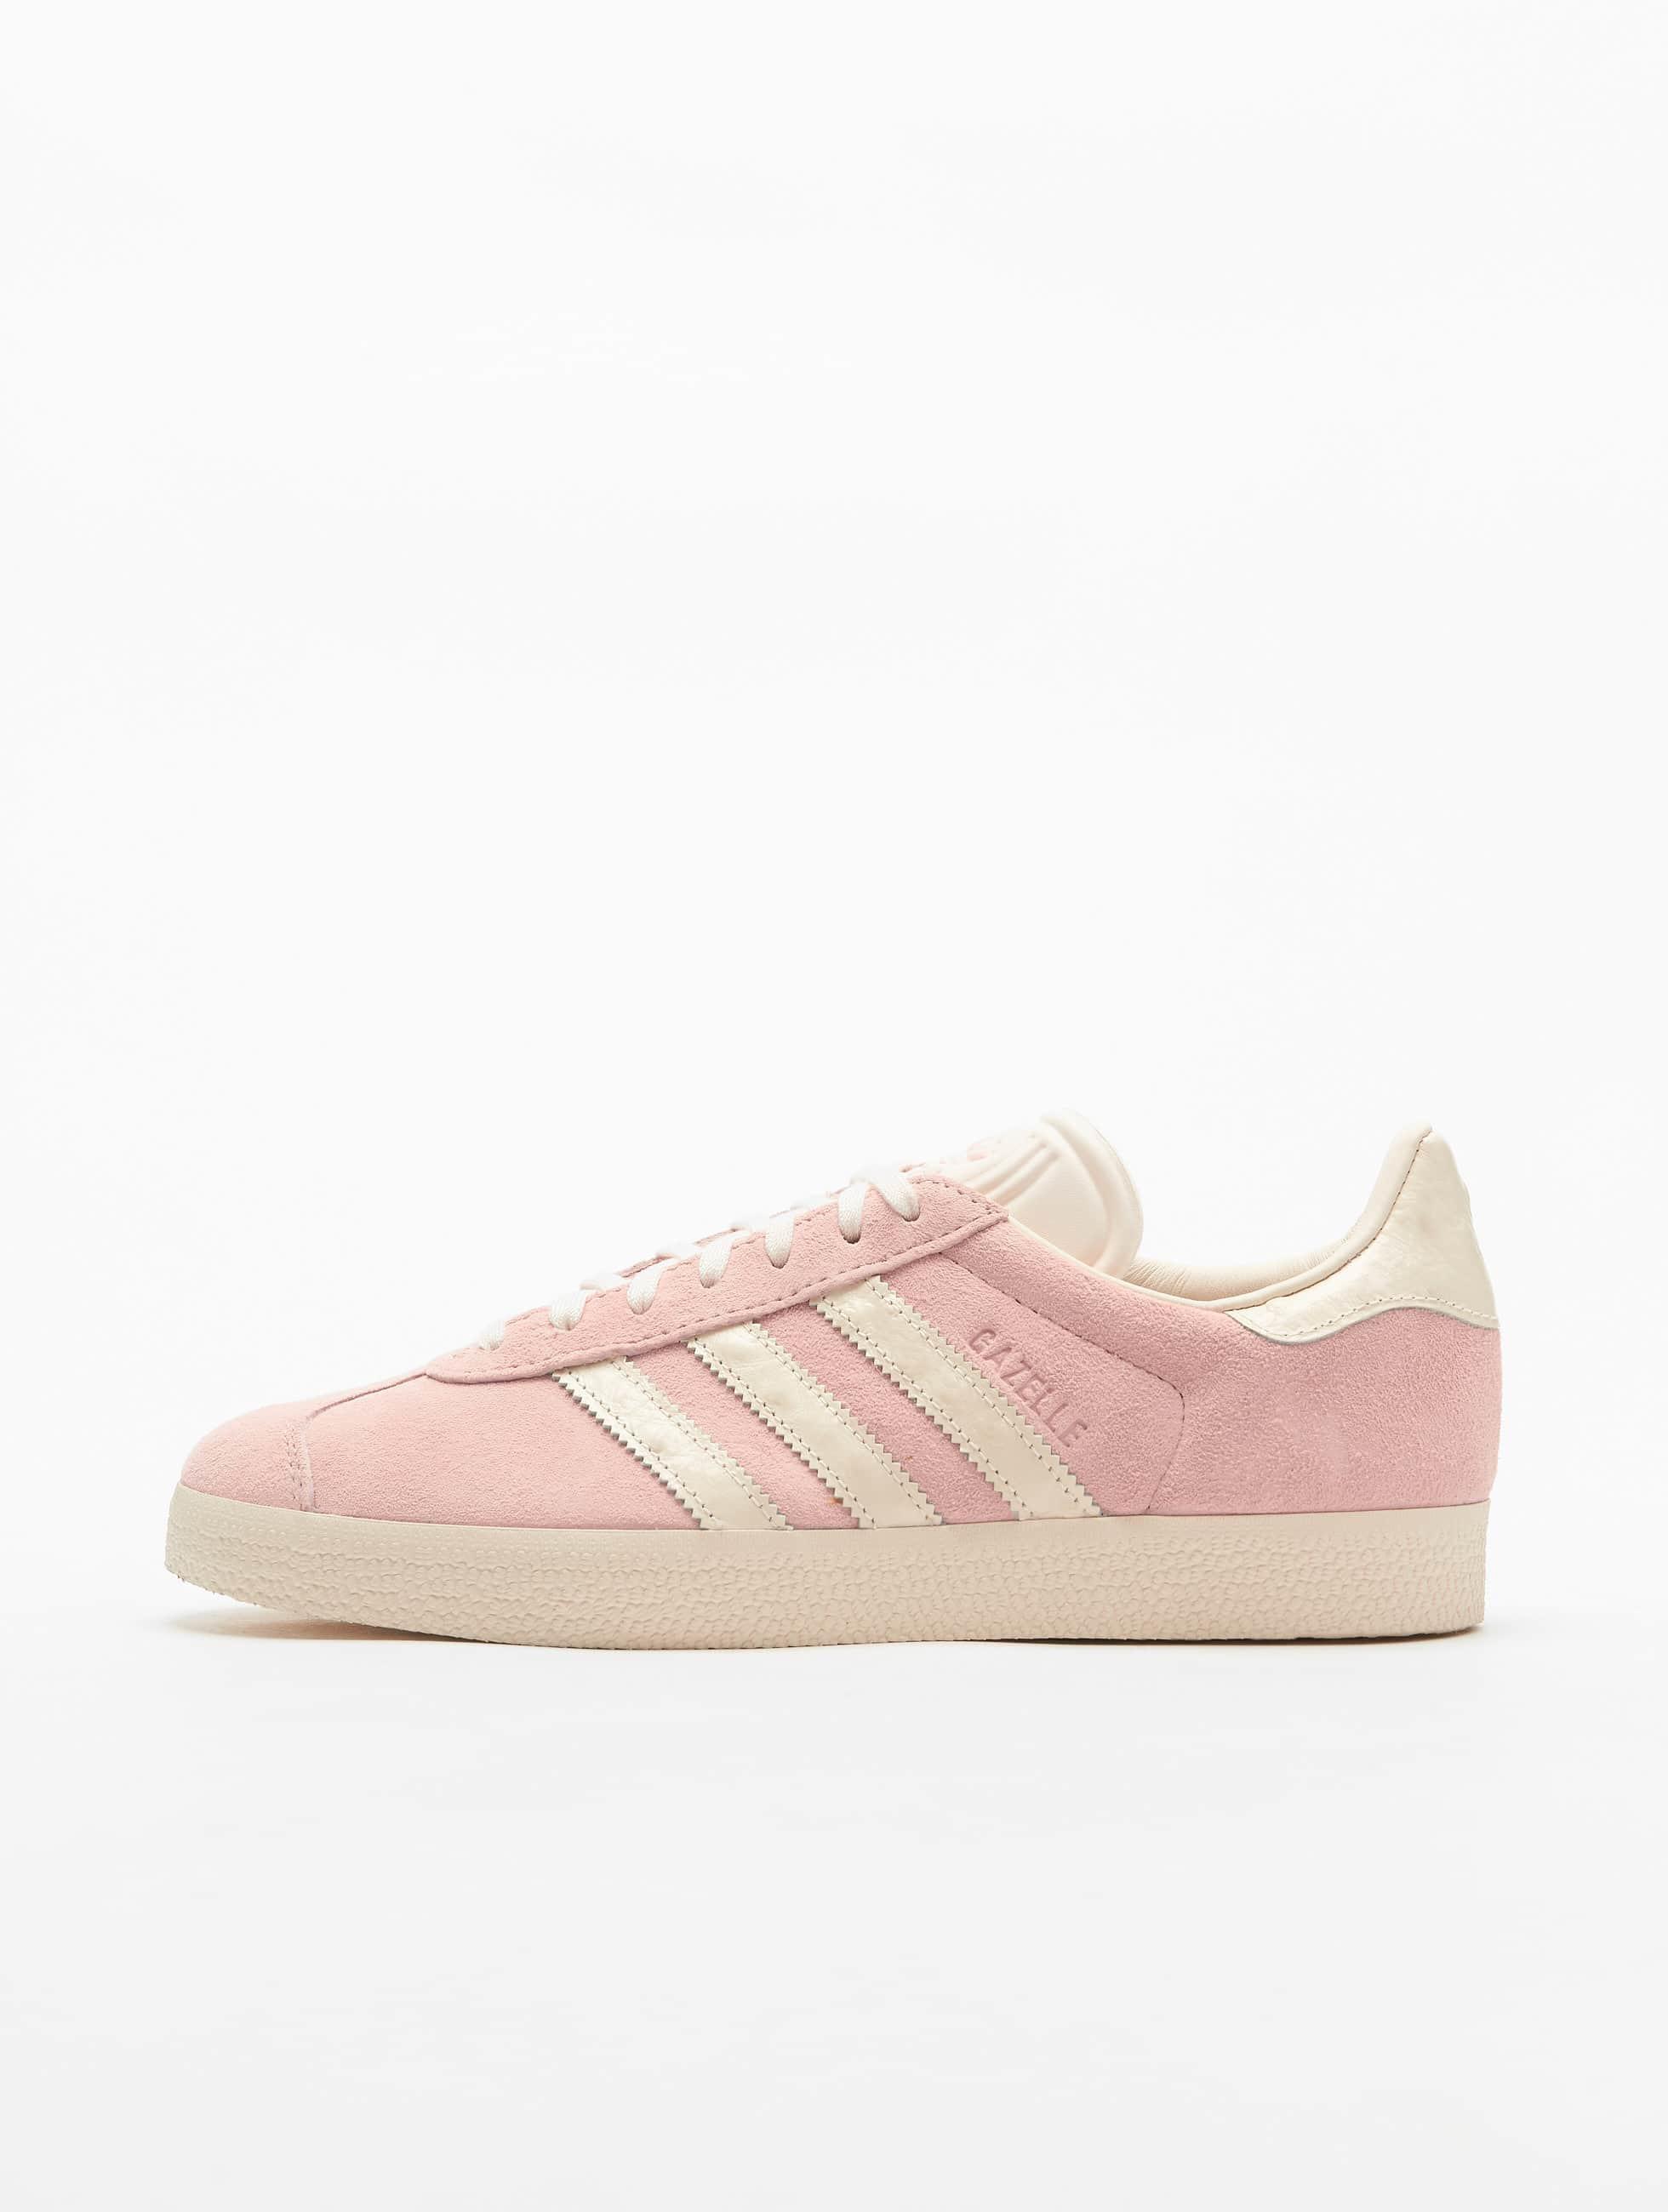 Adidas Originals Gazelle Sneakers Icey Pink F17